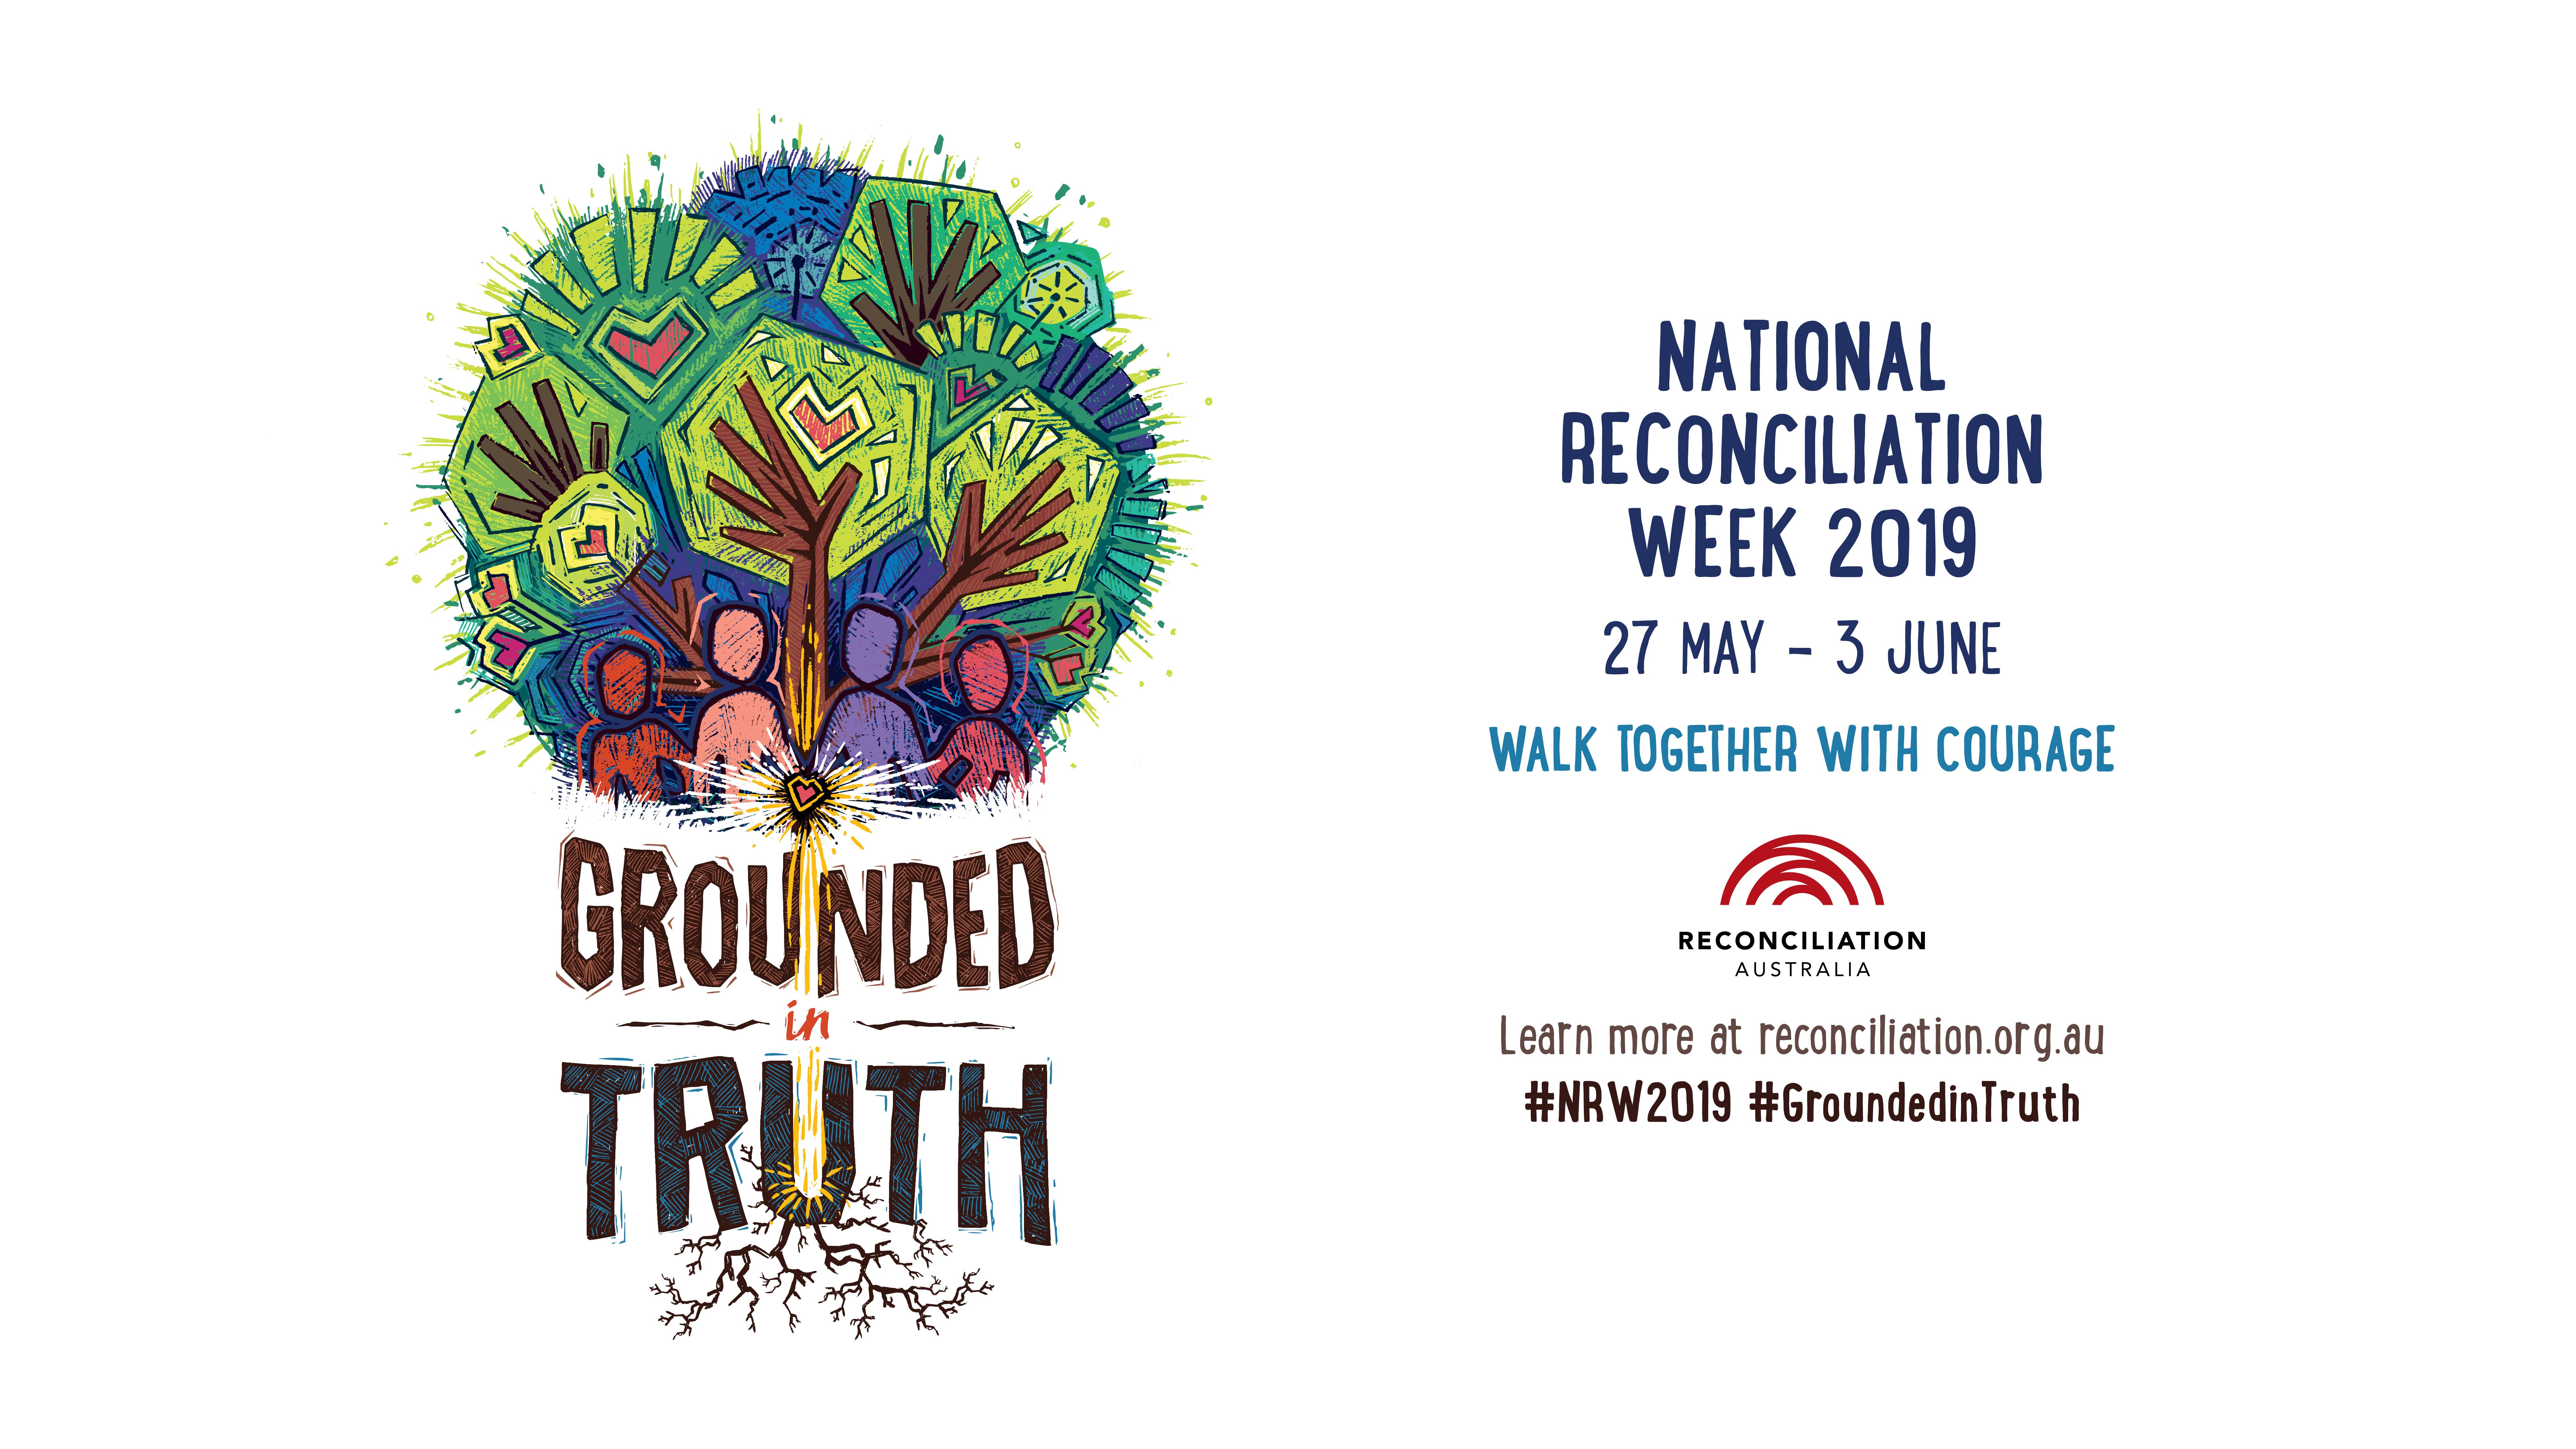 National Reconciliation Week Reconciliation Australia 8000x4500